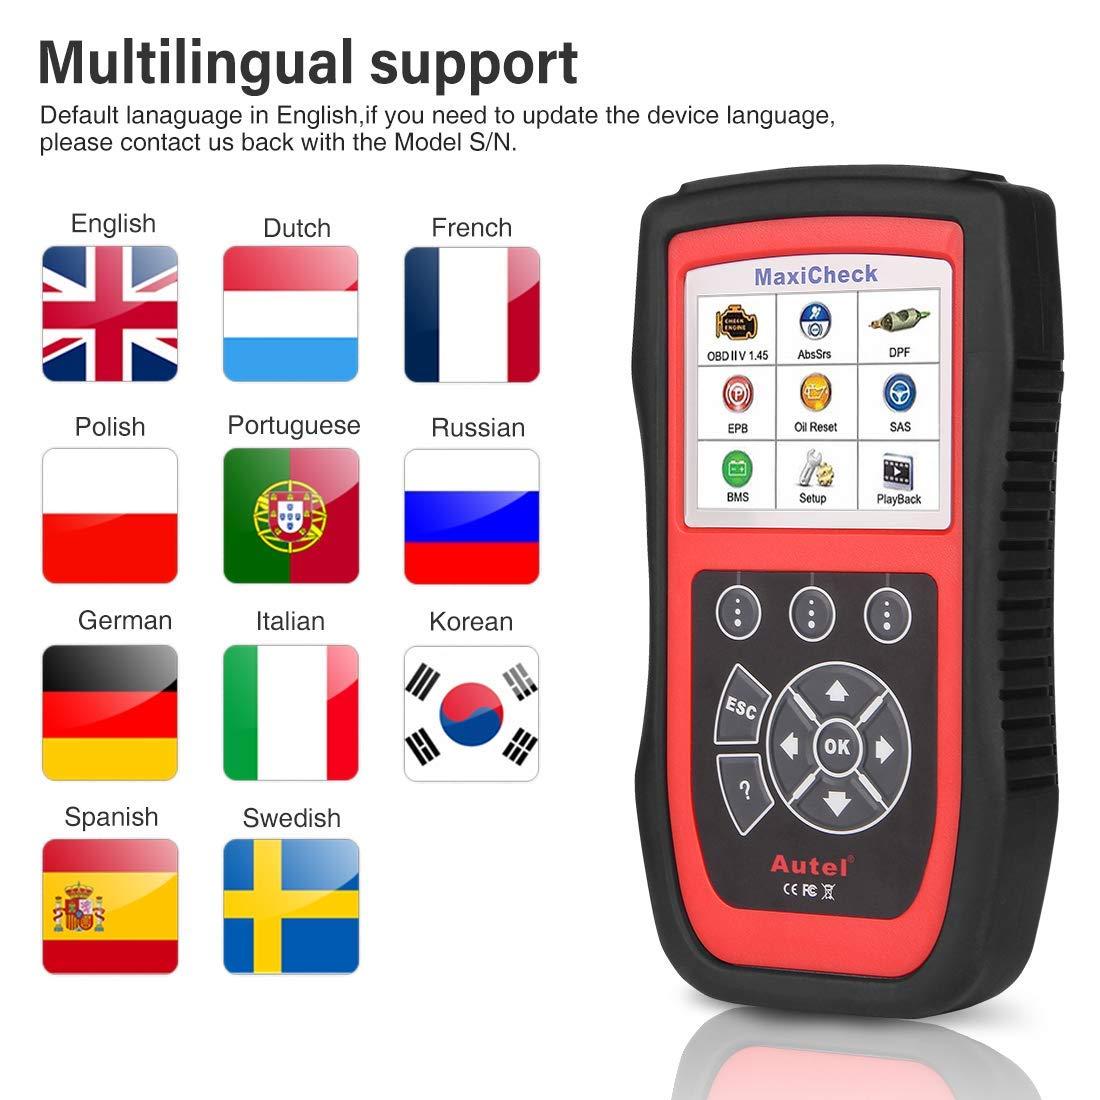 Autel MaxiCheck Pro Herramienta de diagnóstico para Frenos ABS Purga automática,ABS, SRS, BMS, DPF, Servicio de EPB, SAS,luz de Aceite/escáner de ...